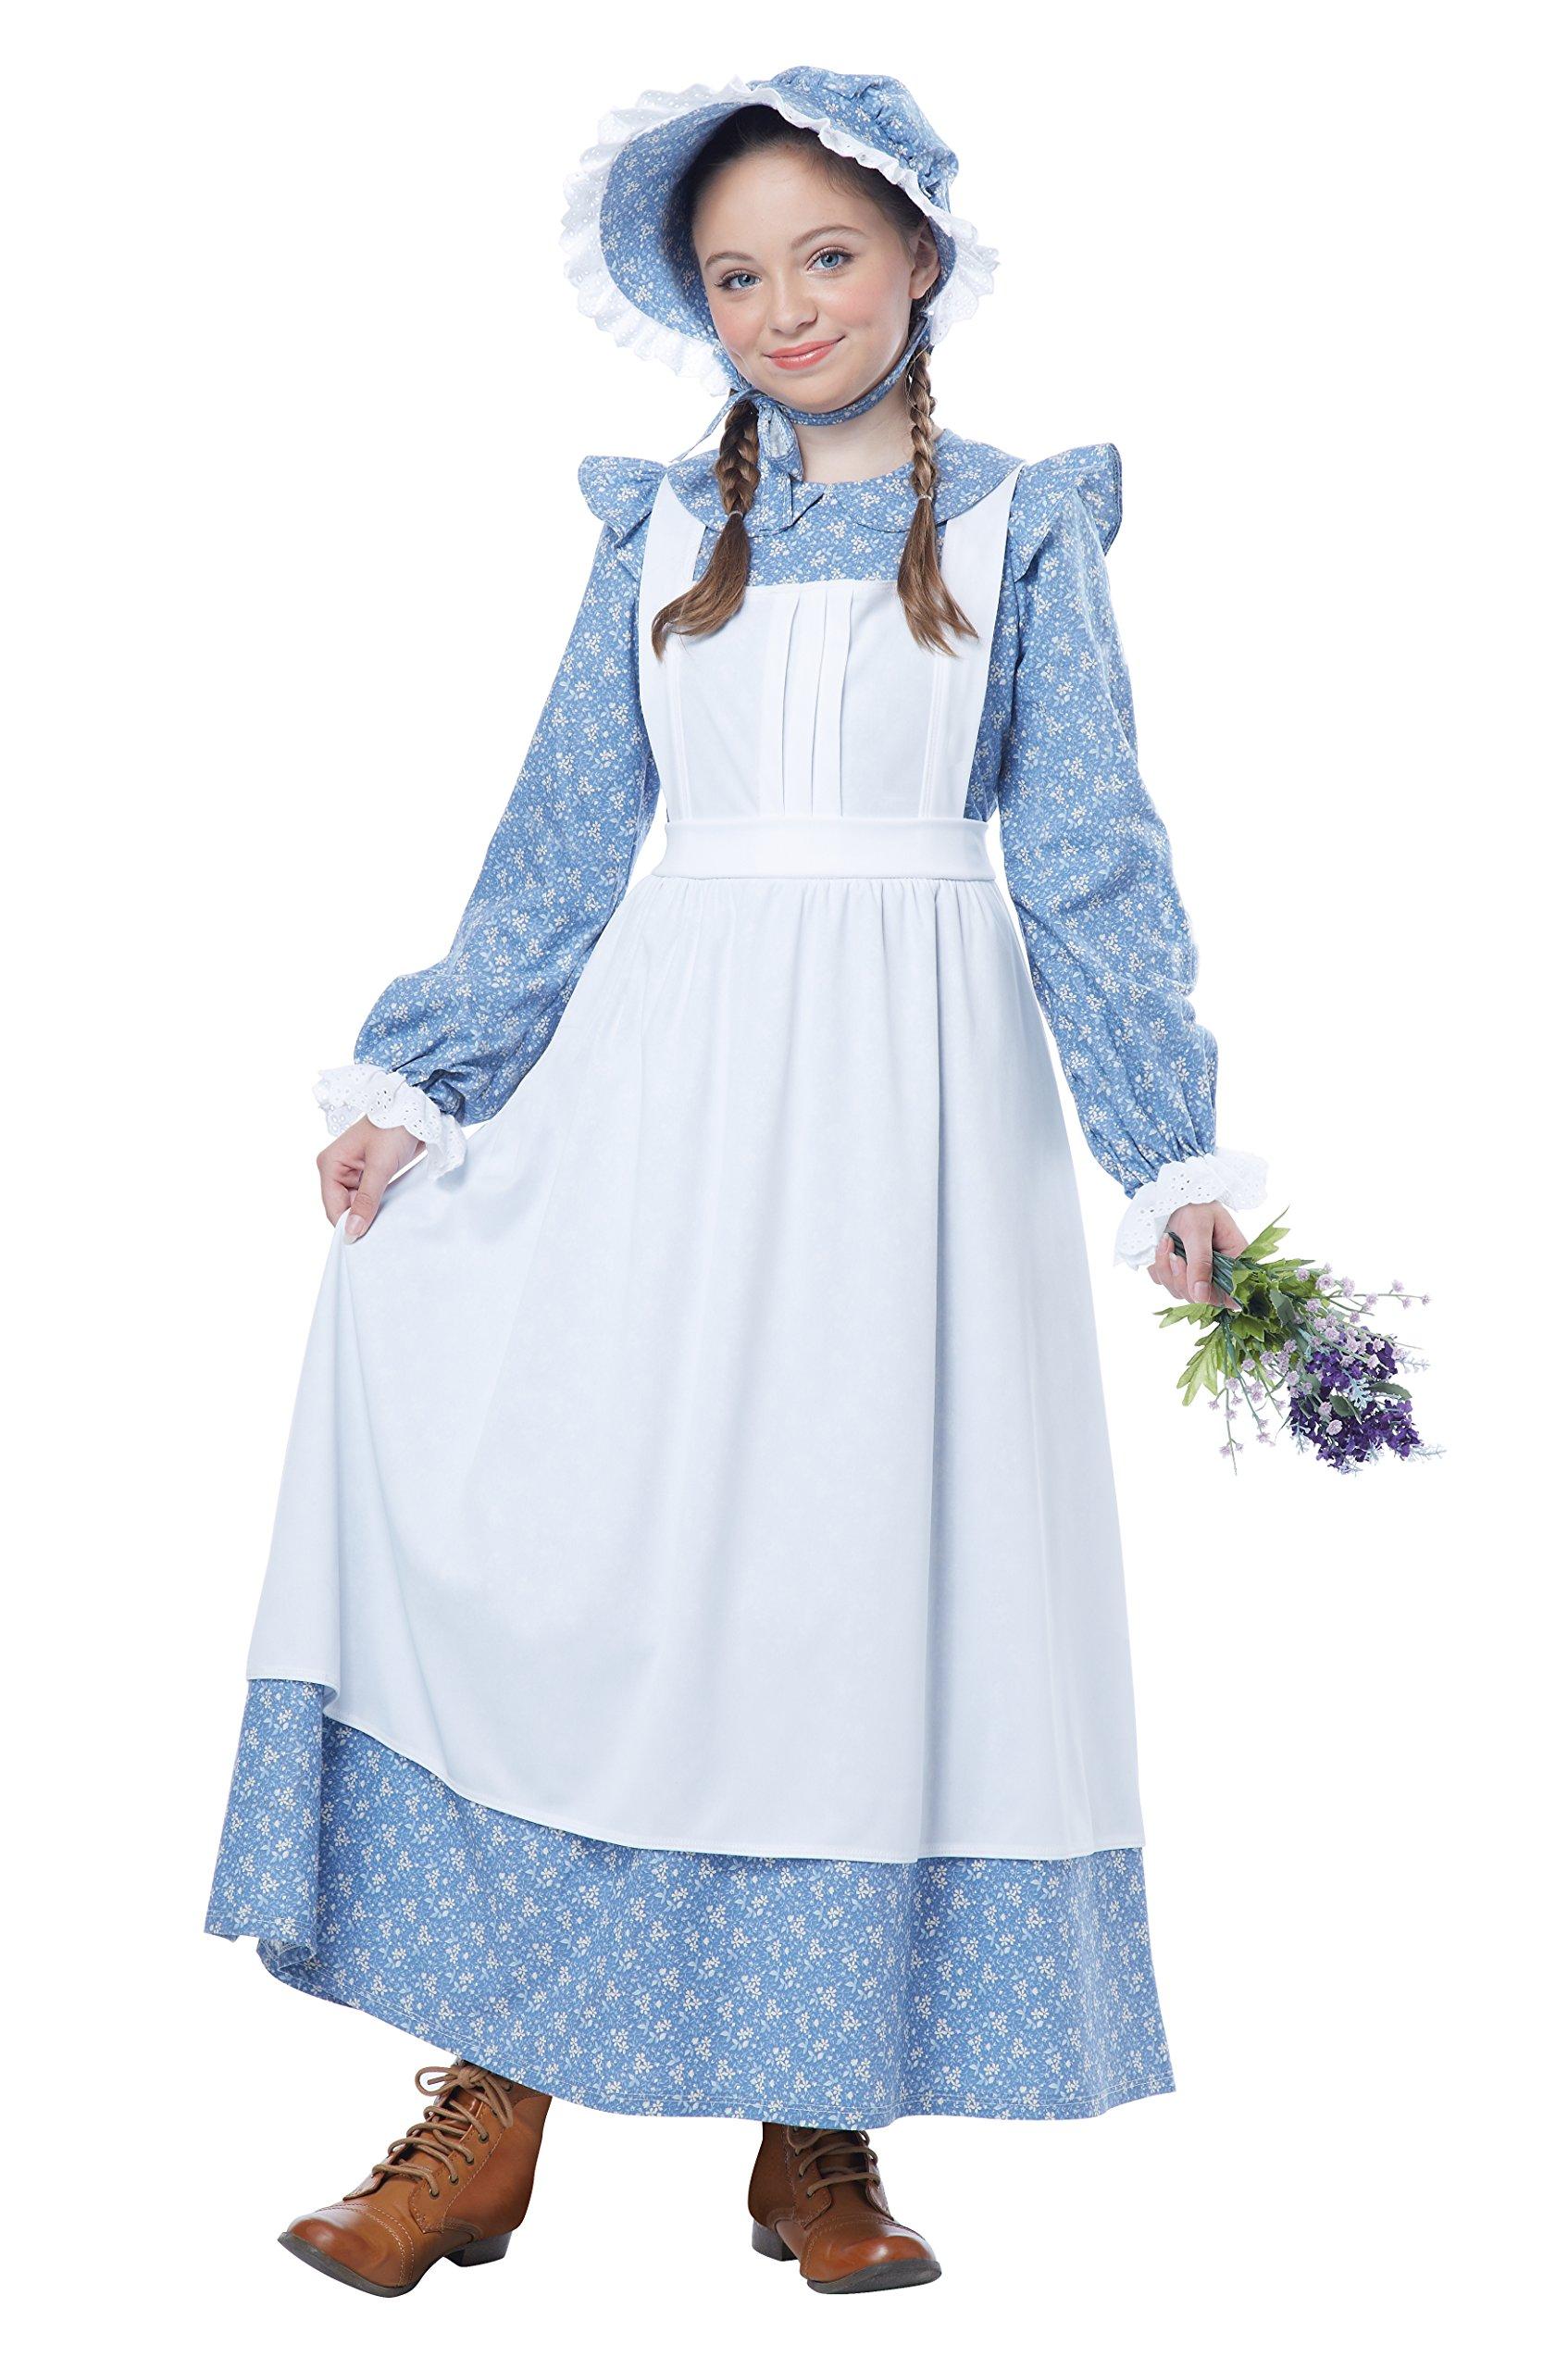 California Costumes Pioneer Girl Child Costume, Blue, Large